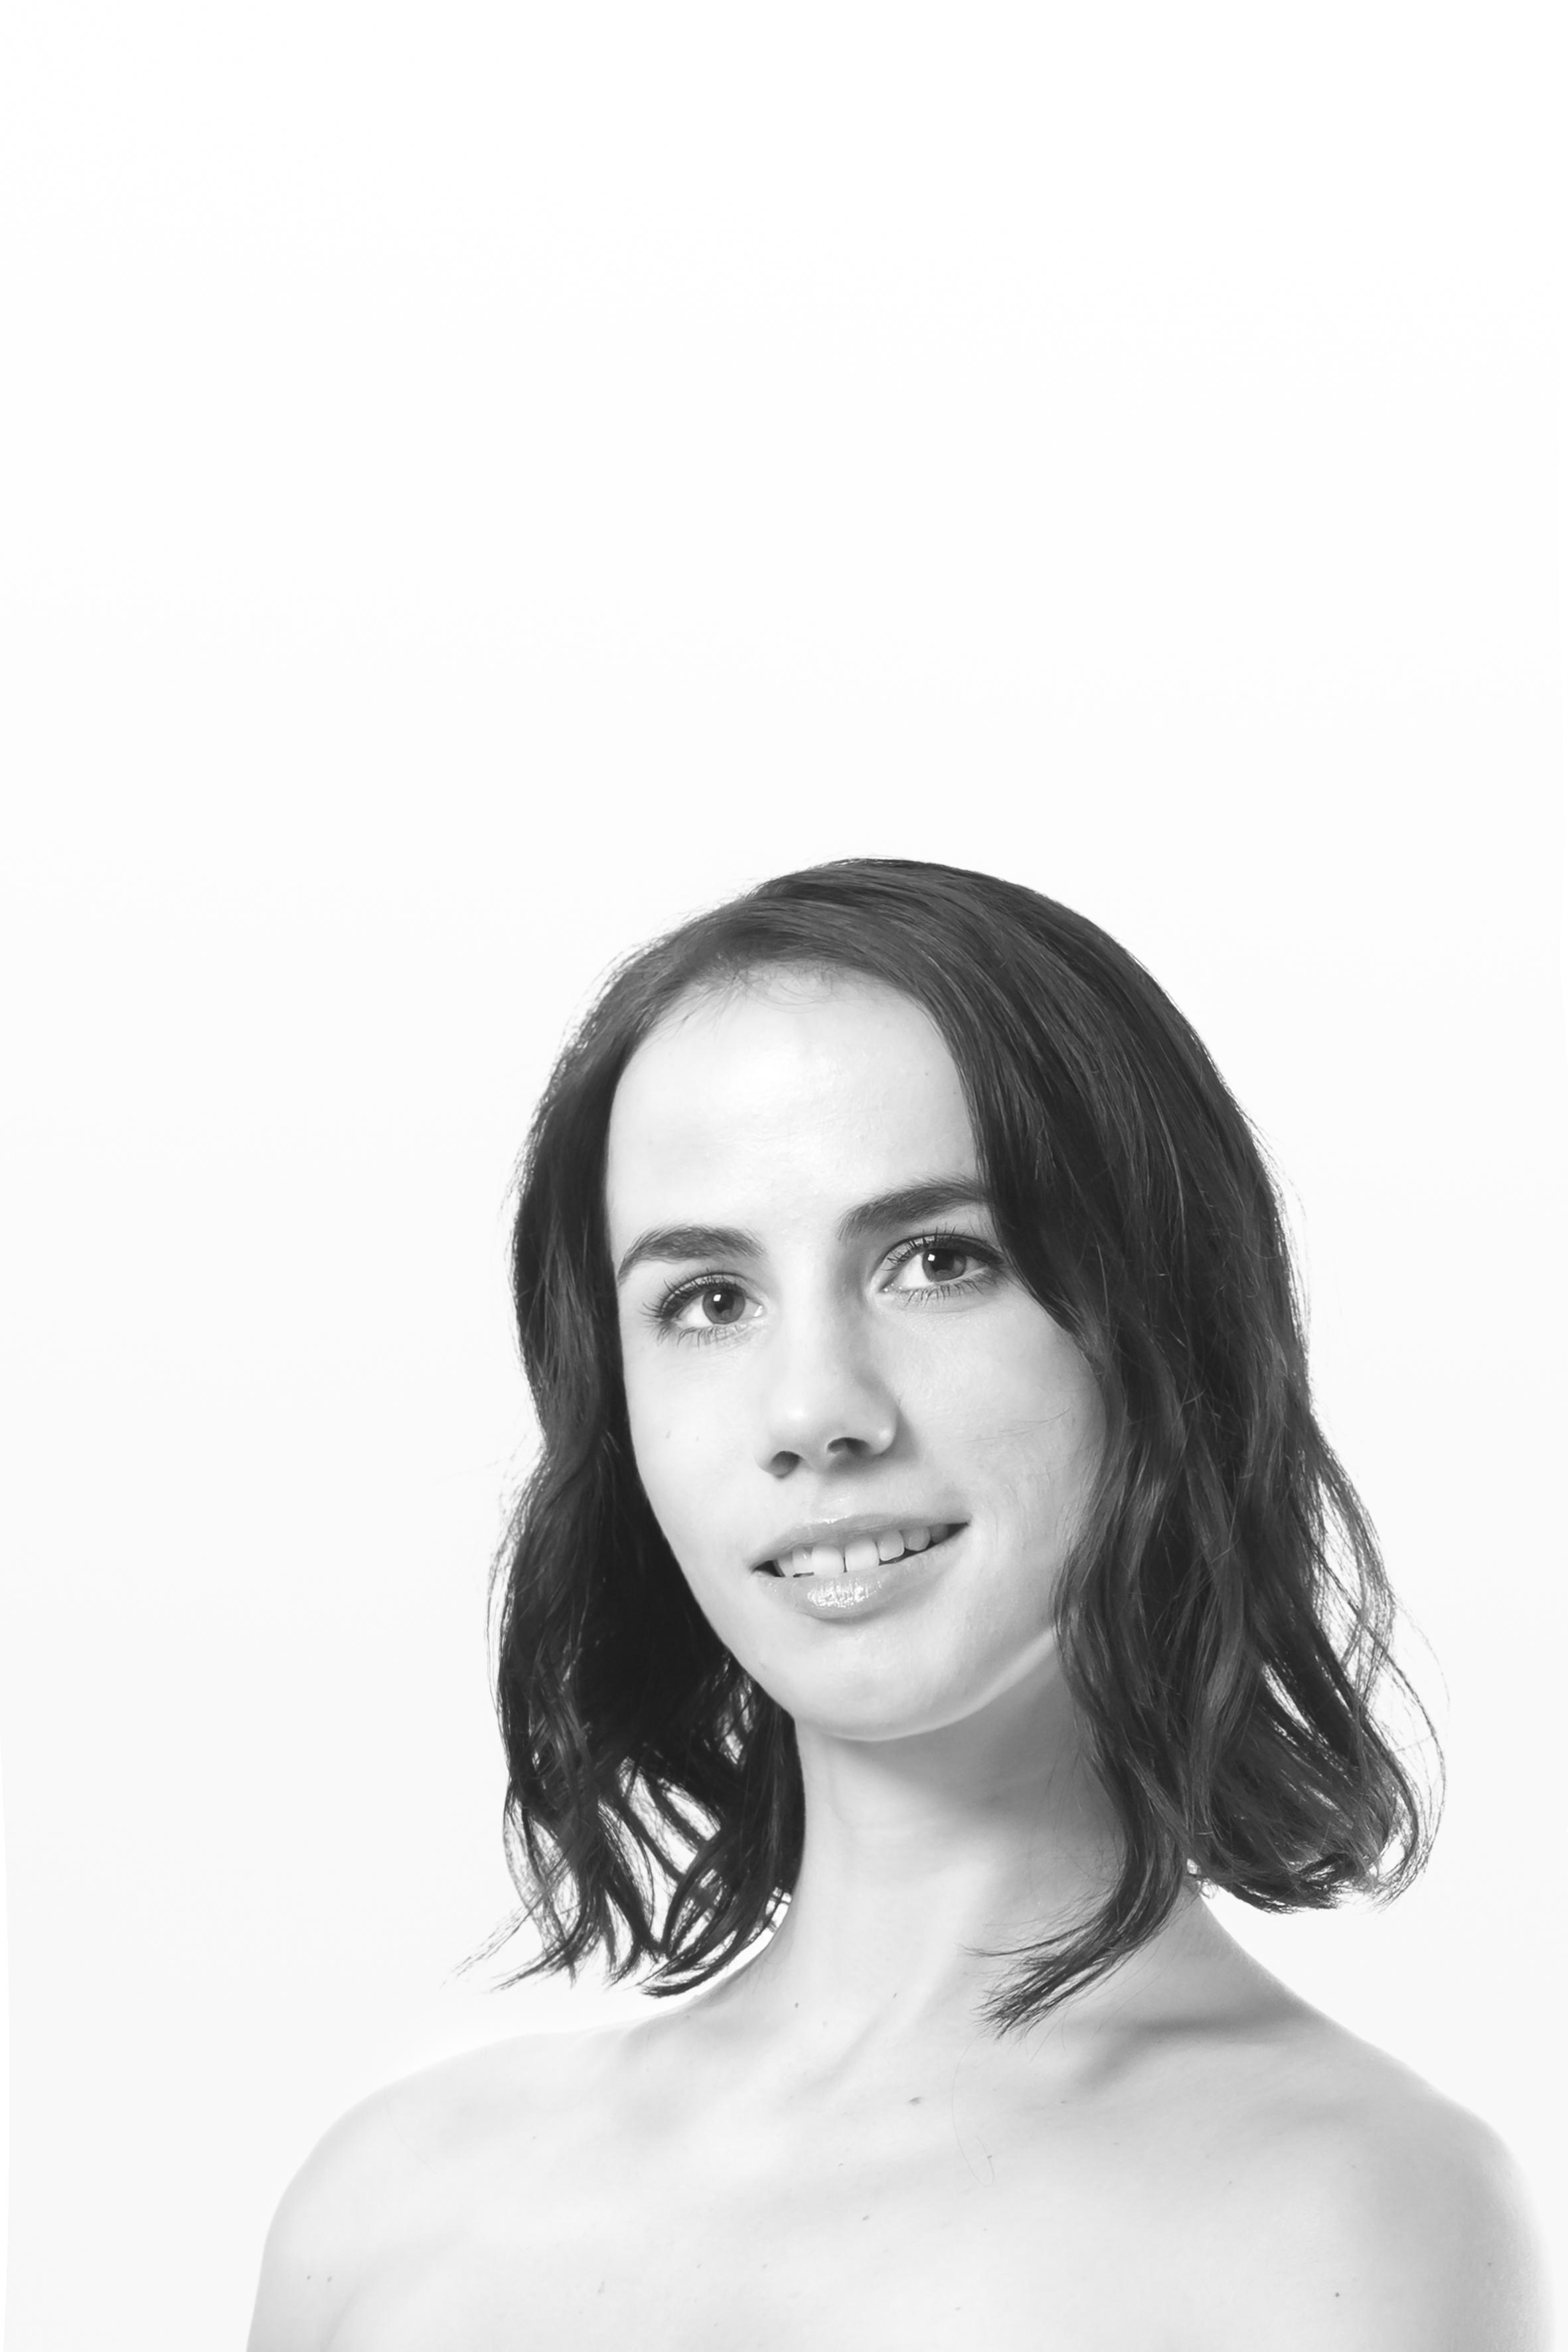 Nadezhda Antipenko